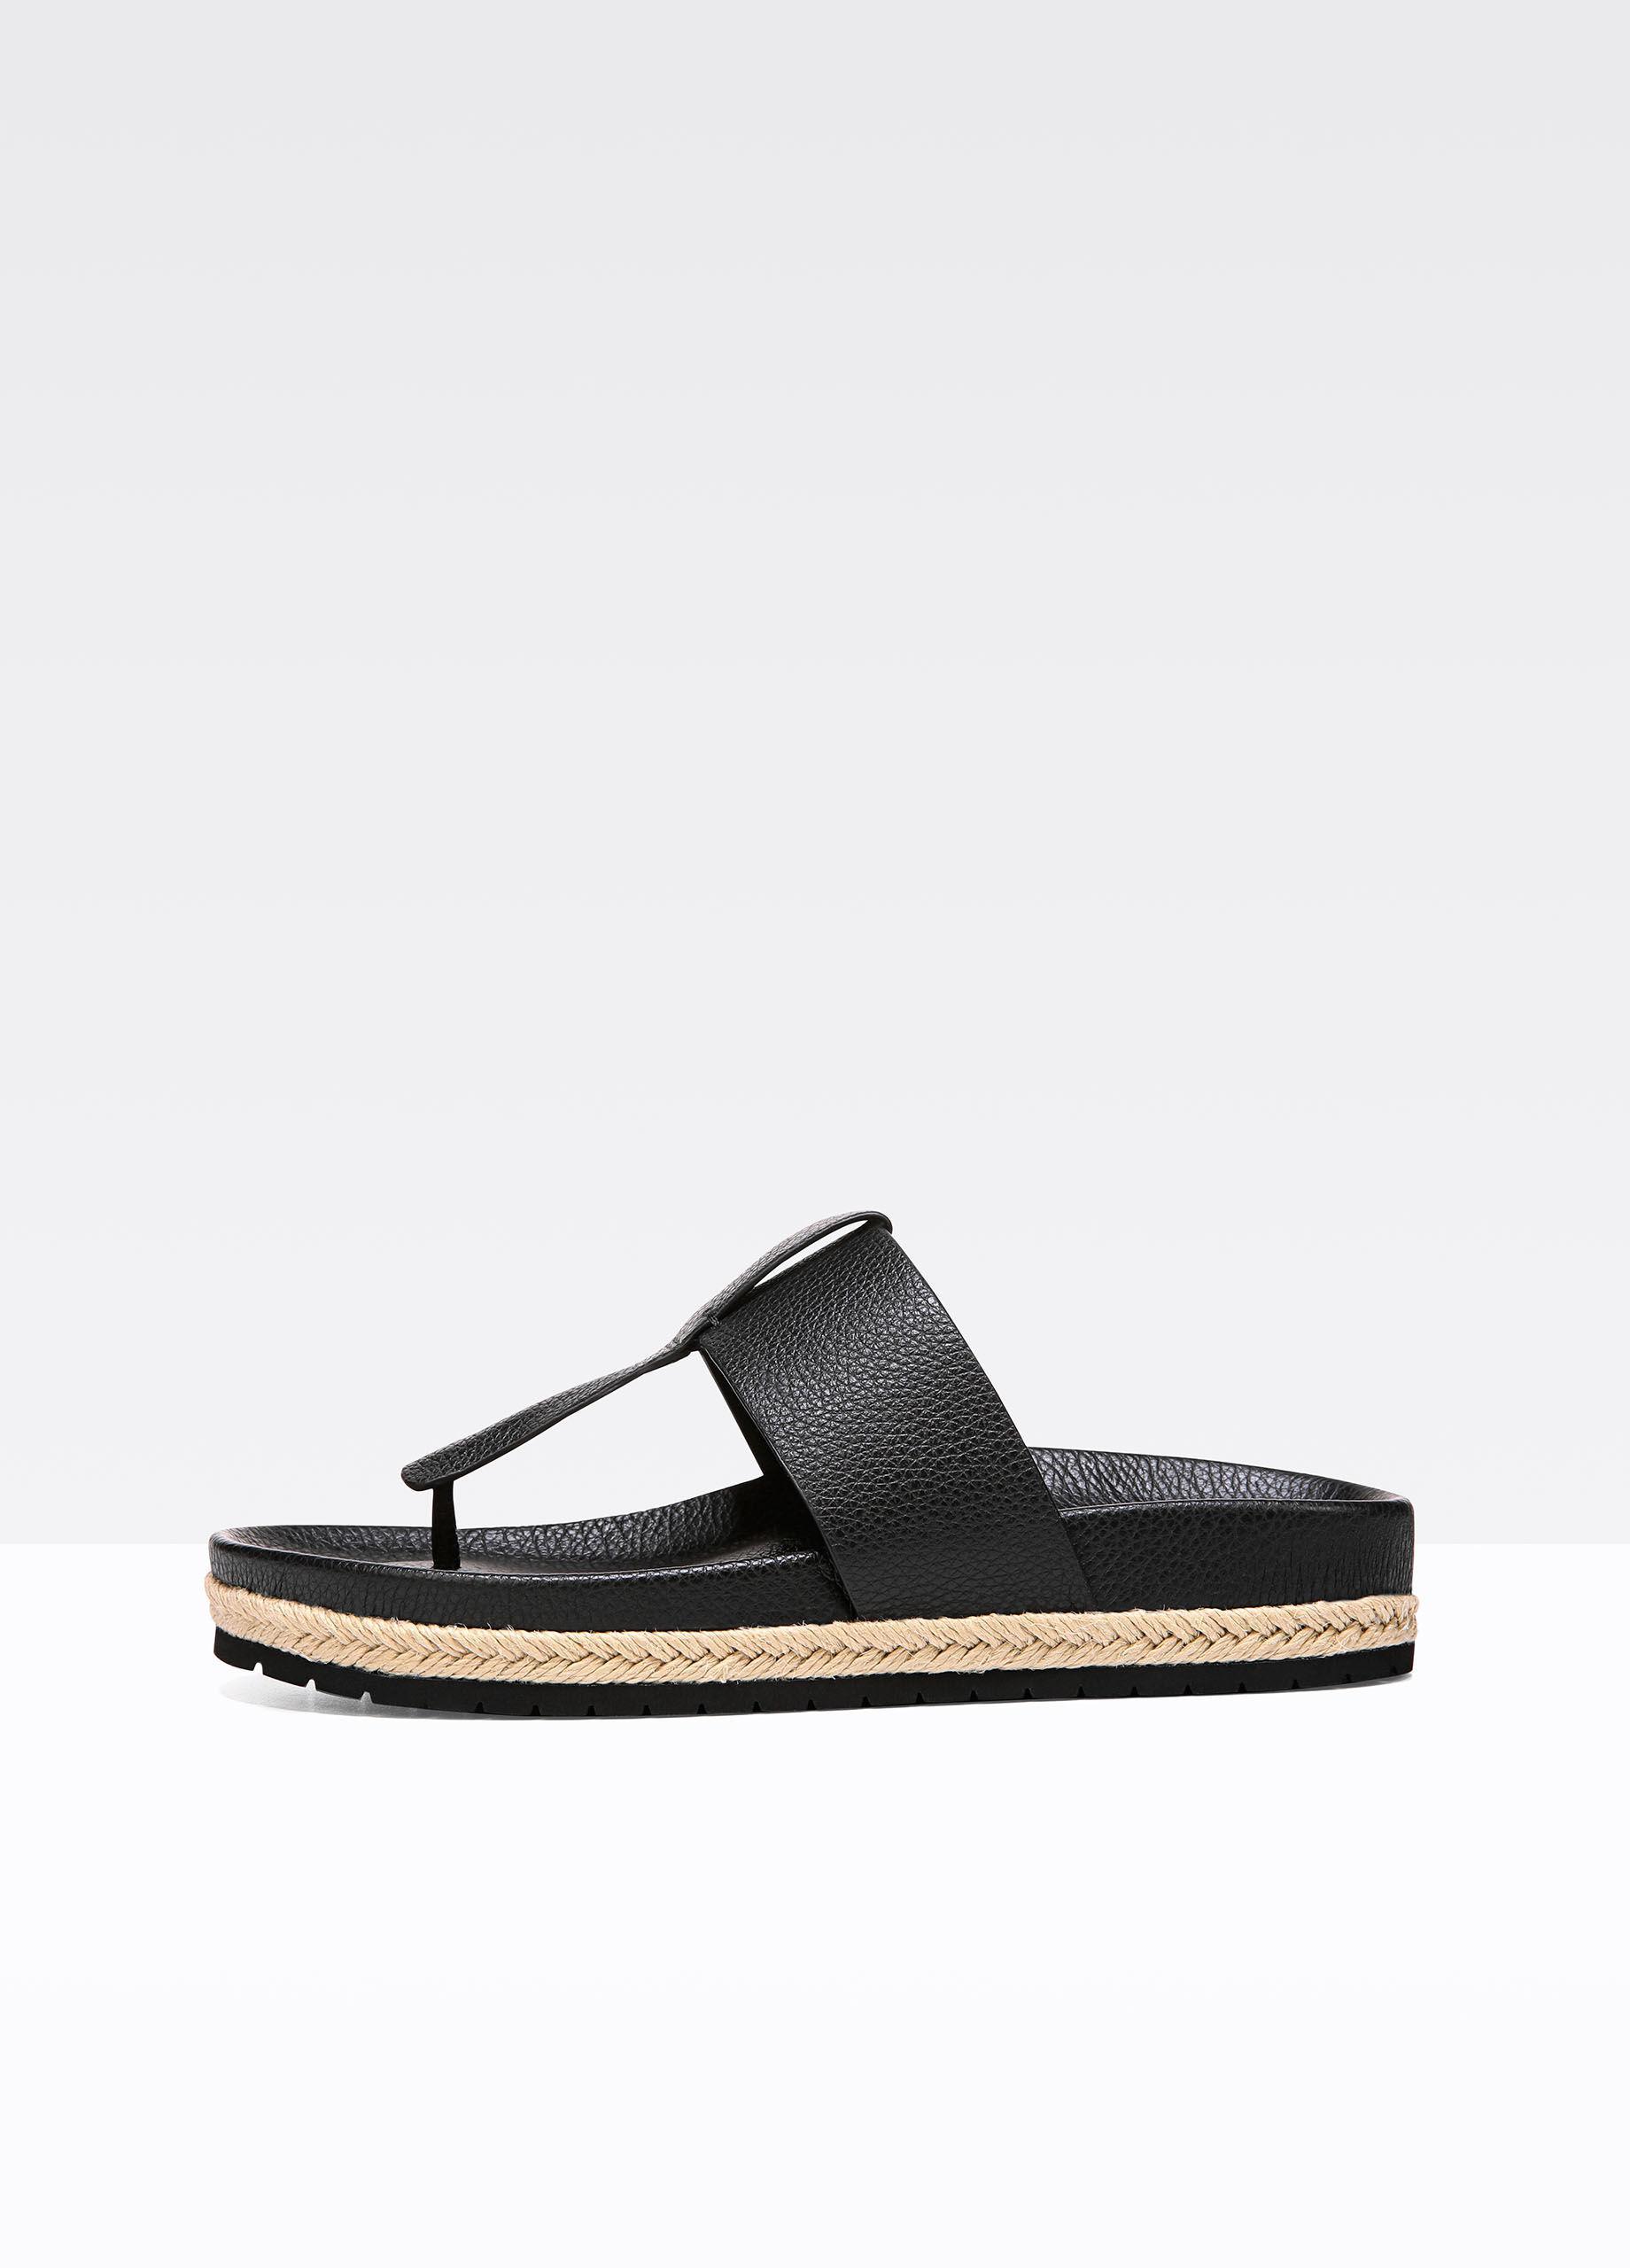 Vince Women's Avani Leather Thong Platform Sandals TdLFwi